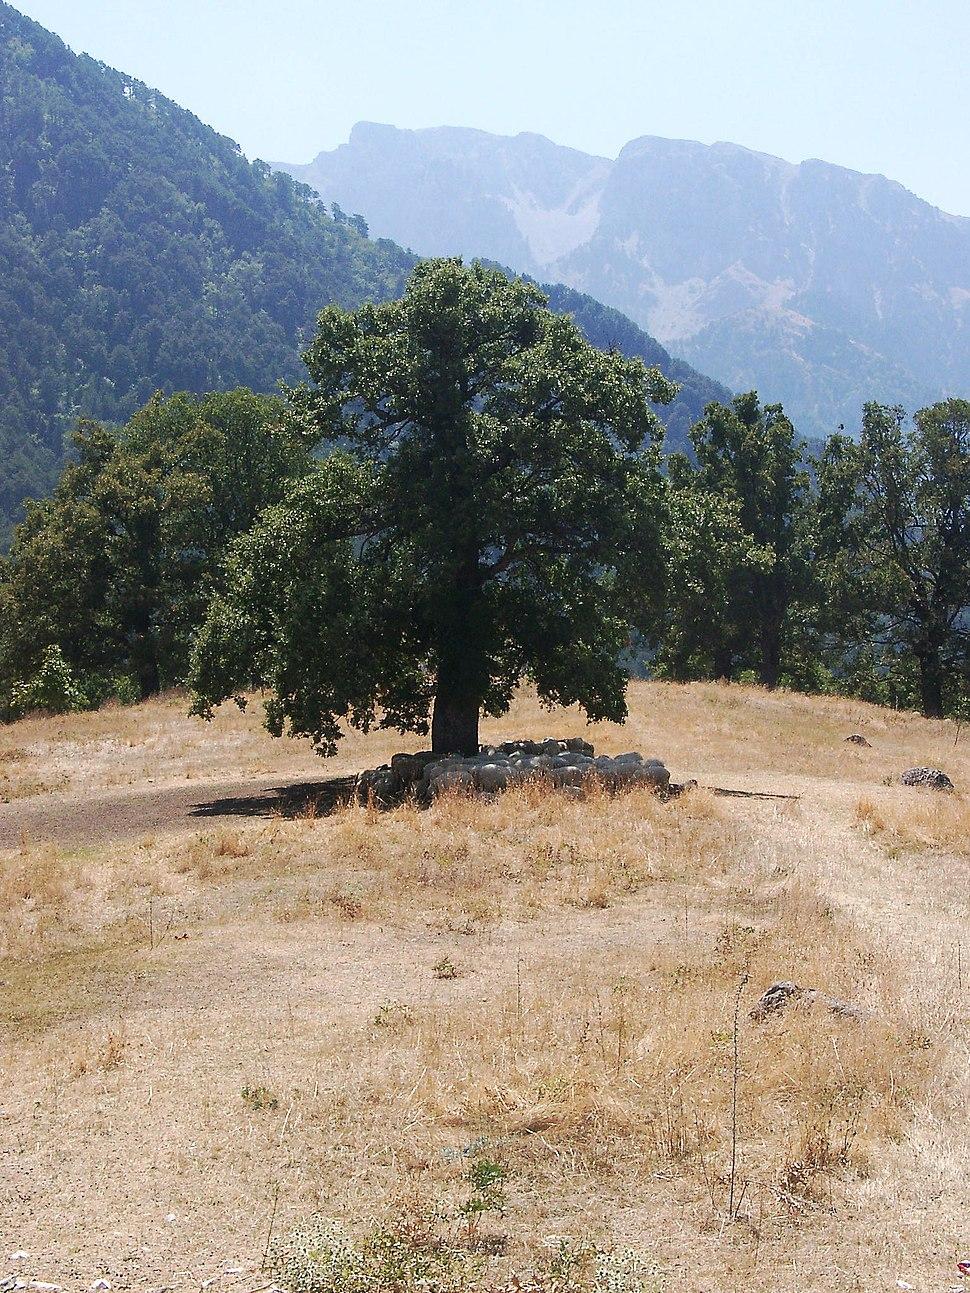 Sheep in shadow, Konitsa, Ioannina prefecture, Greece